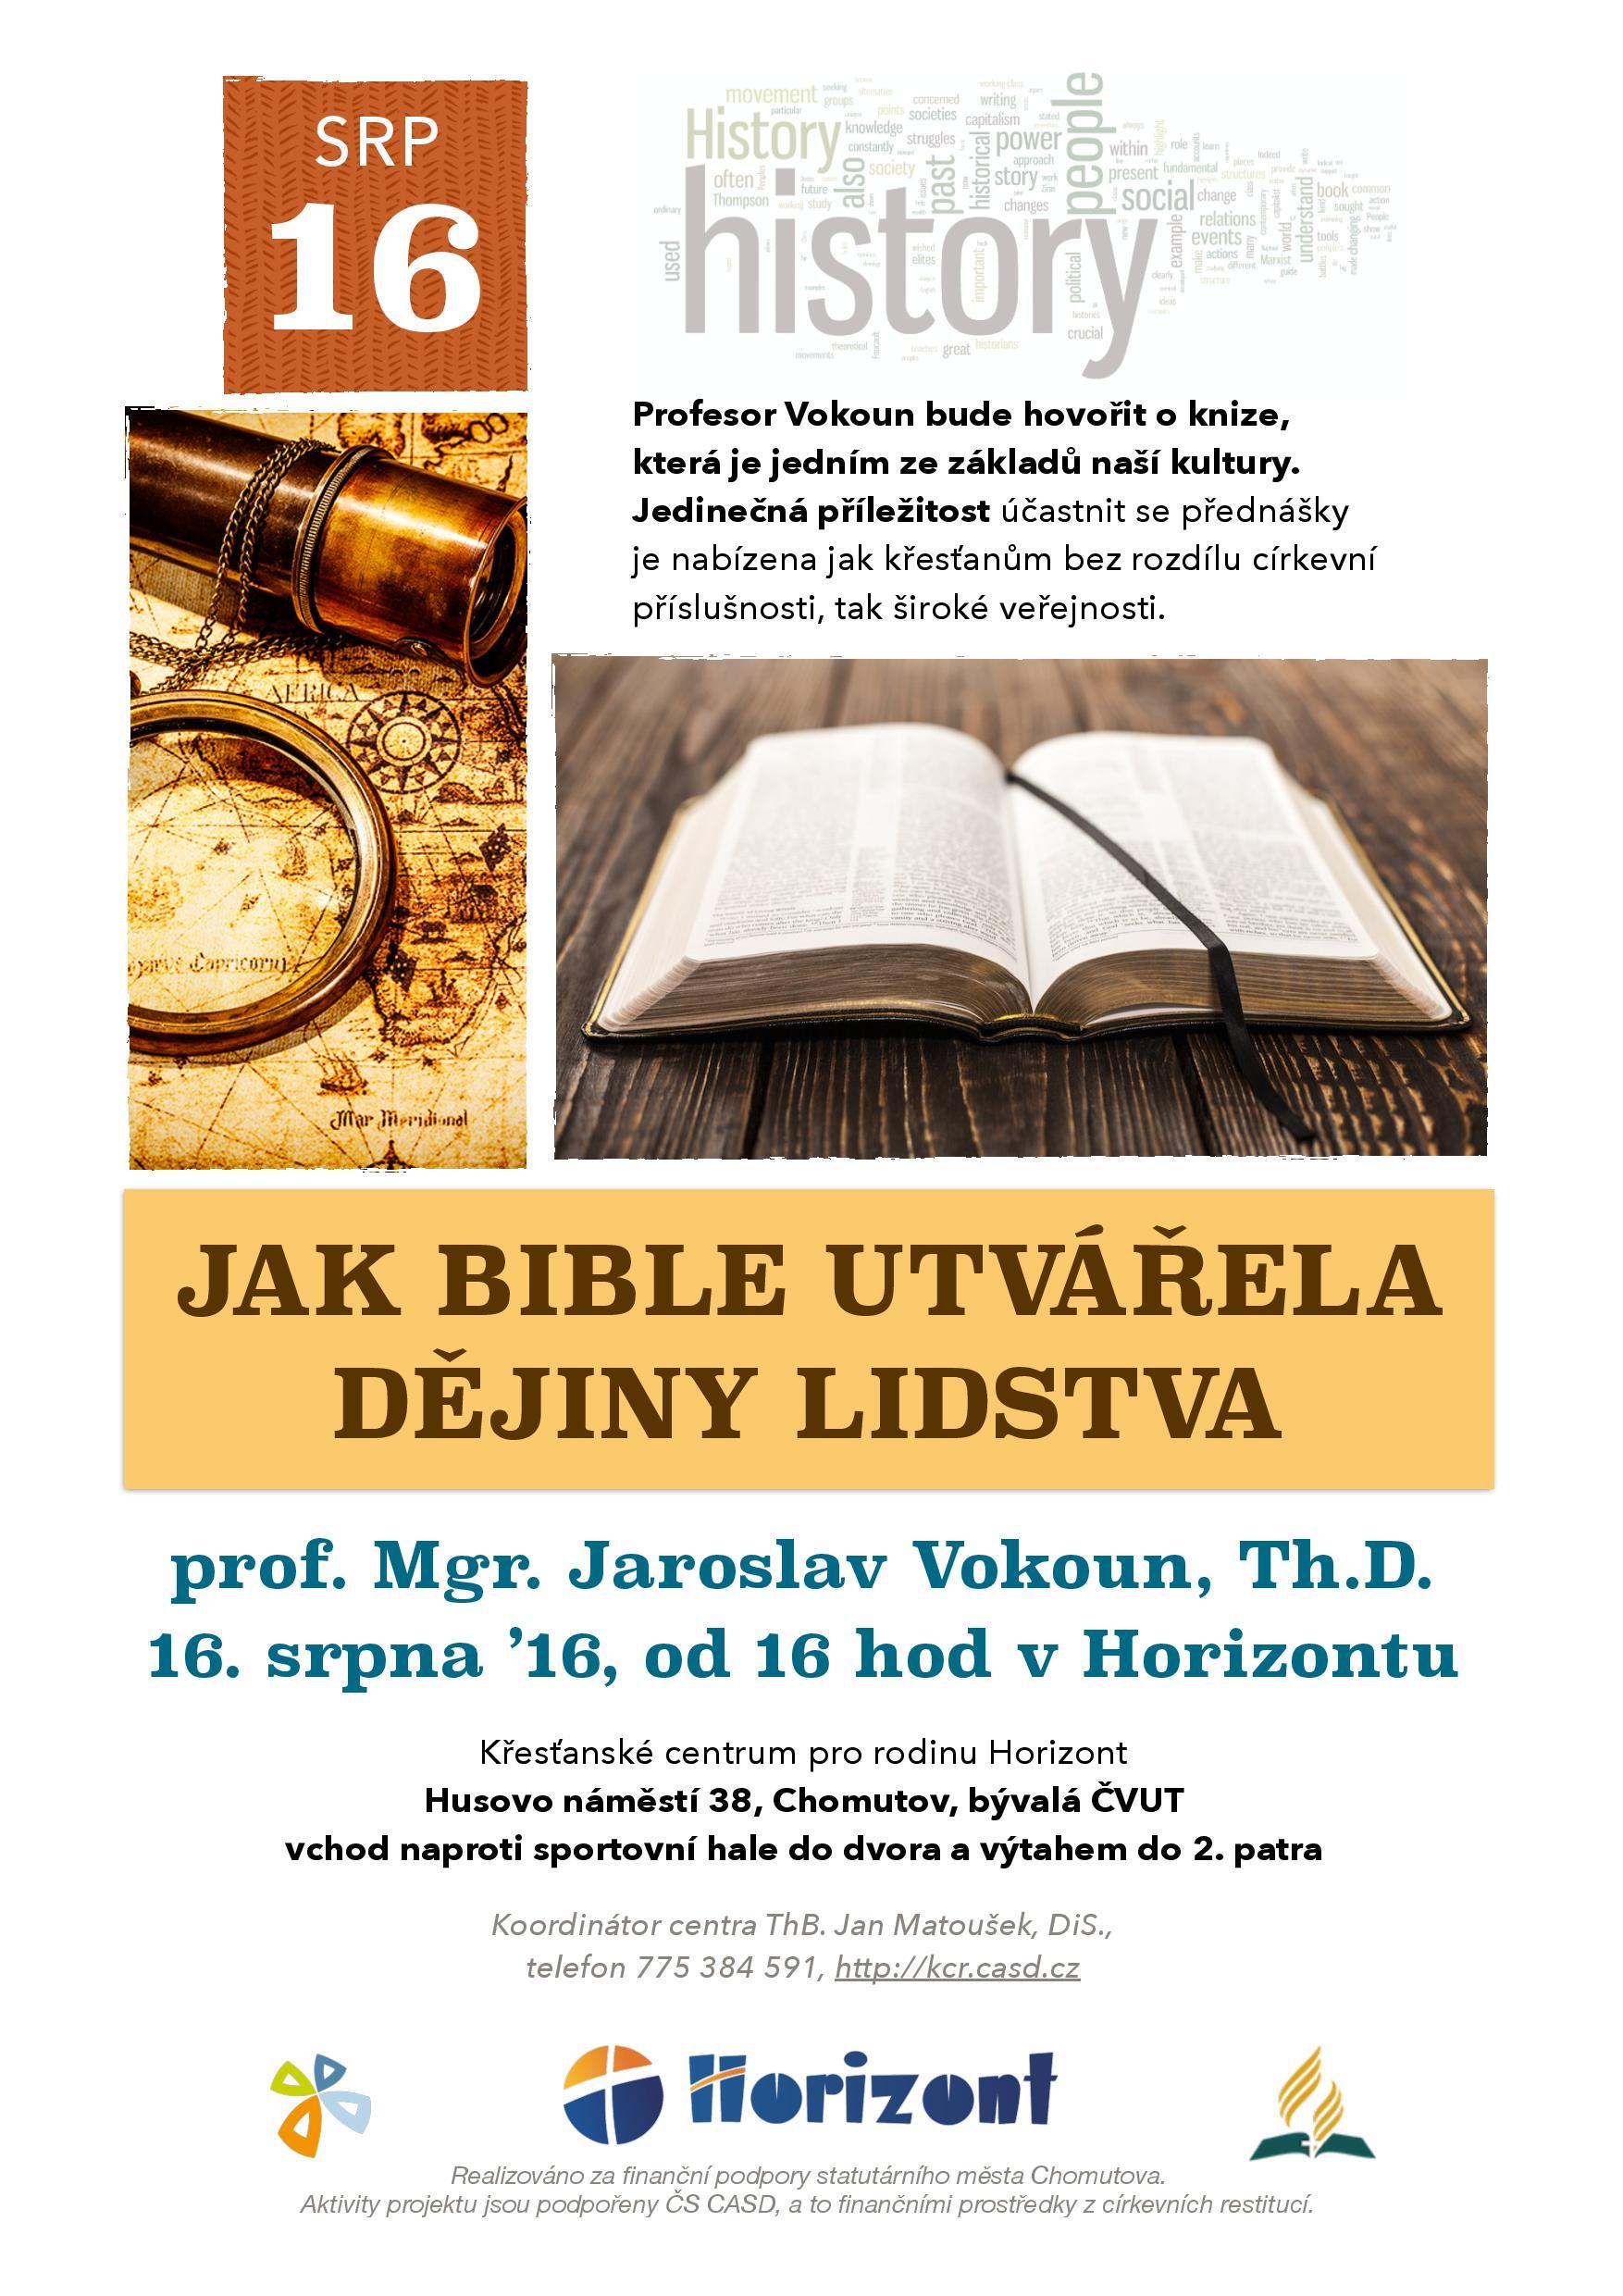 Prof. Vokoun v Horizontu-page-001